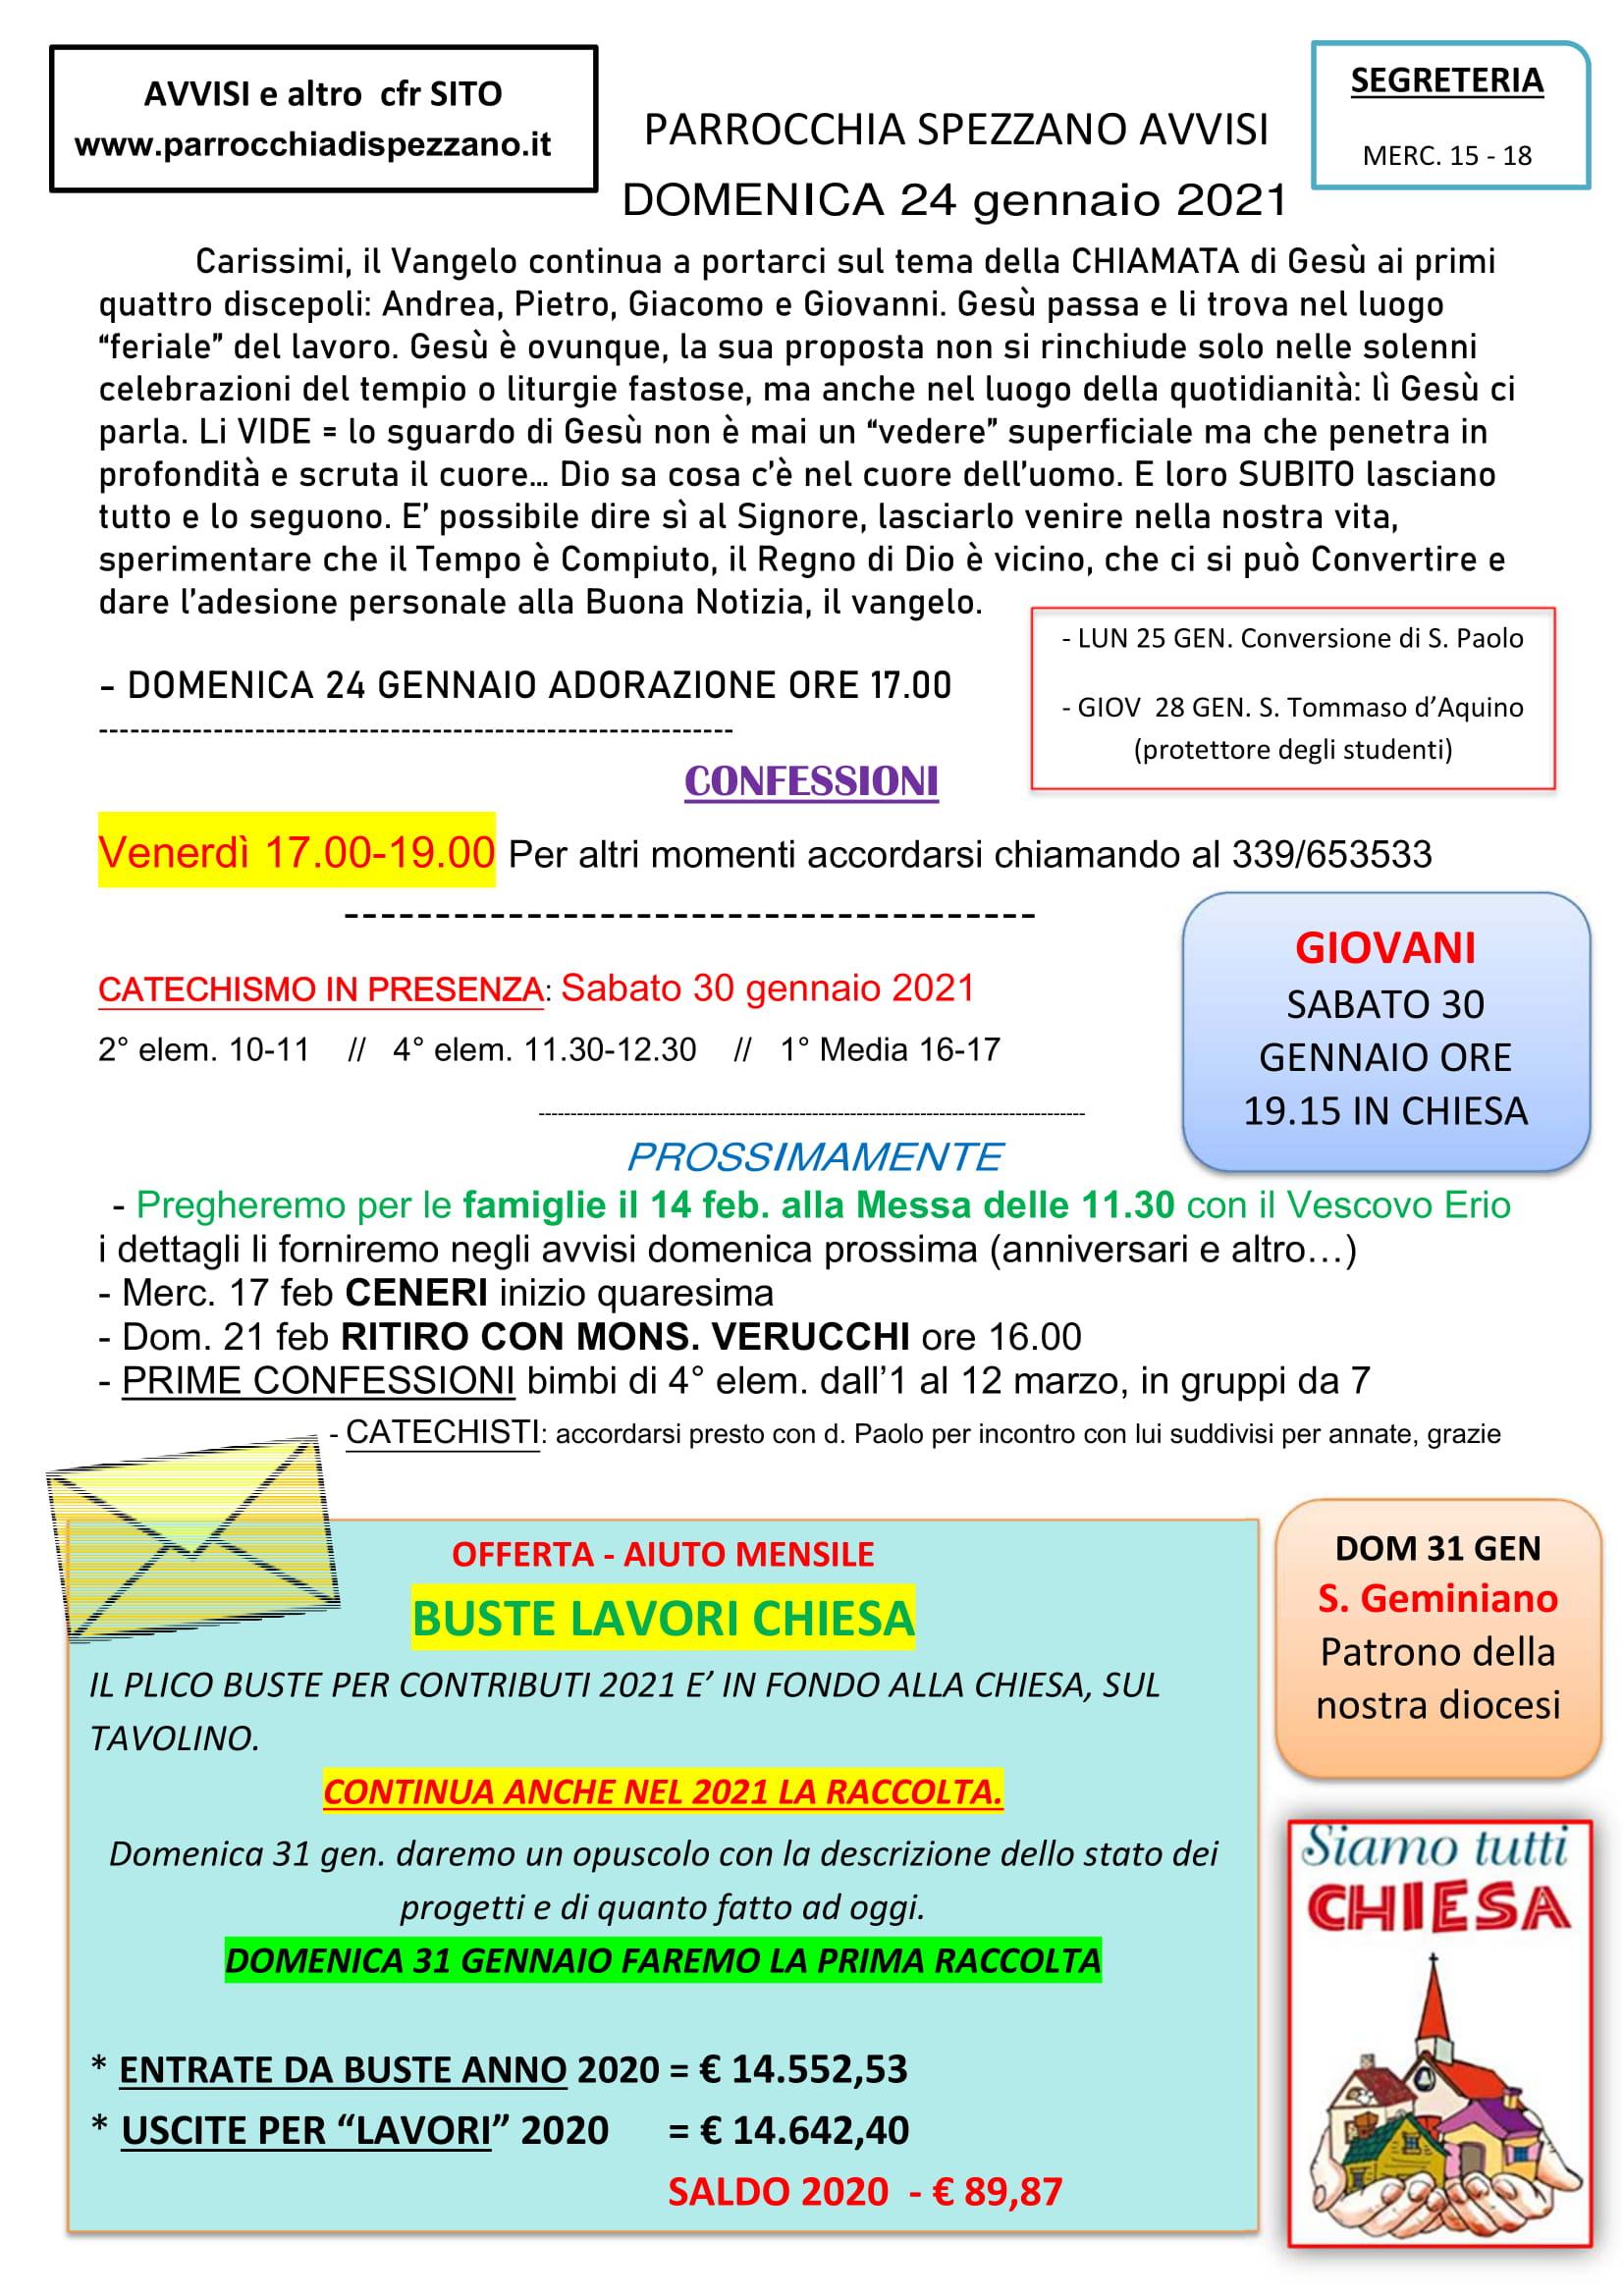 AVVISI DOMENICA 24 GENNAIO 2021-1